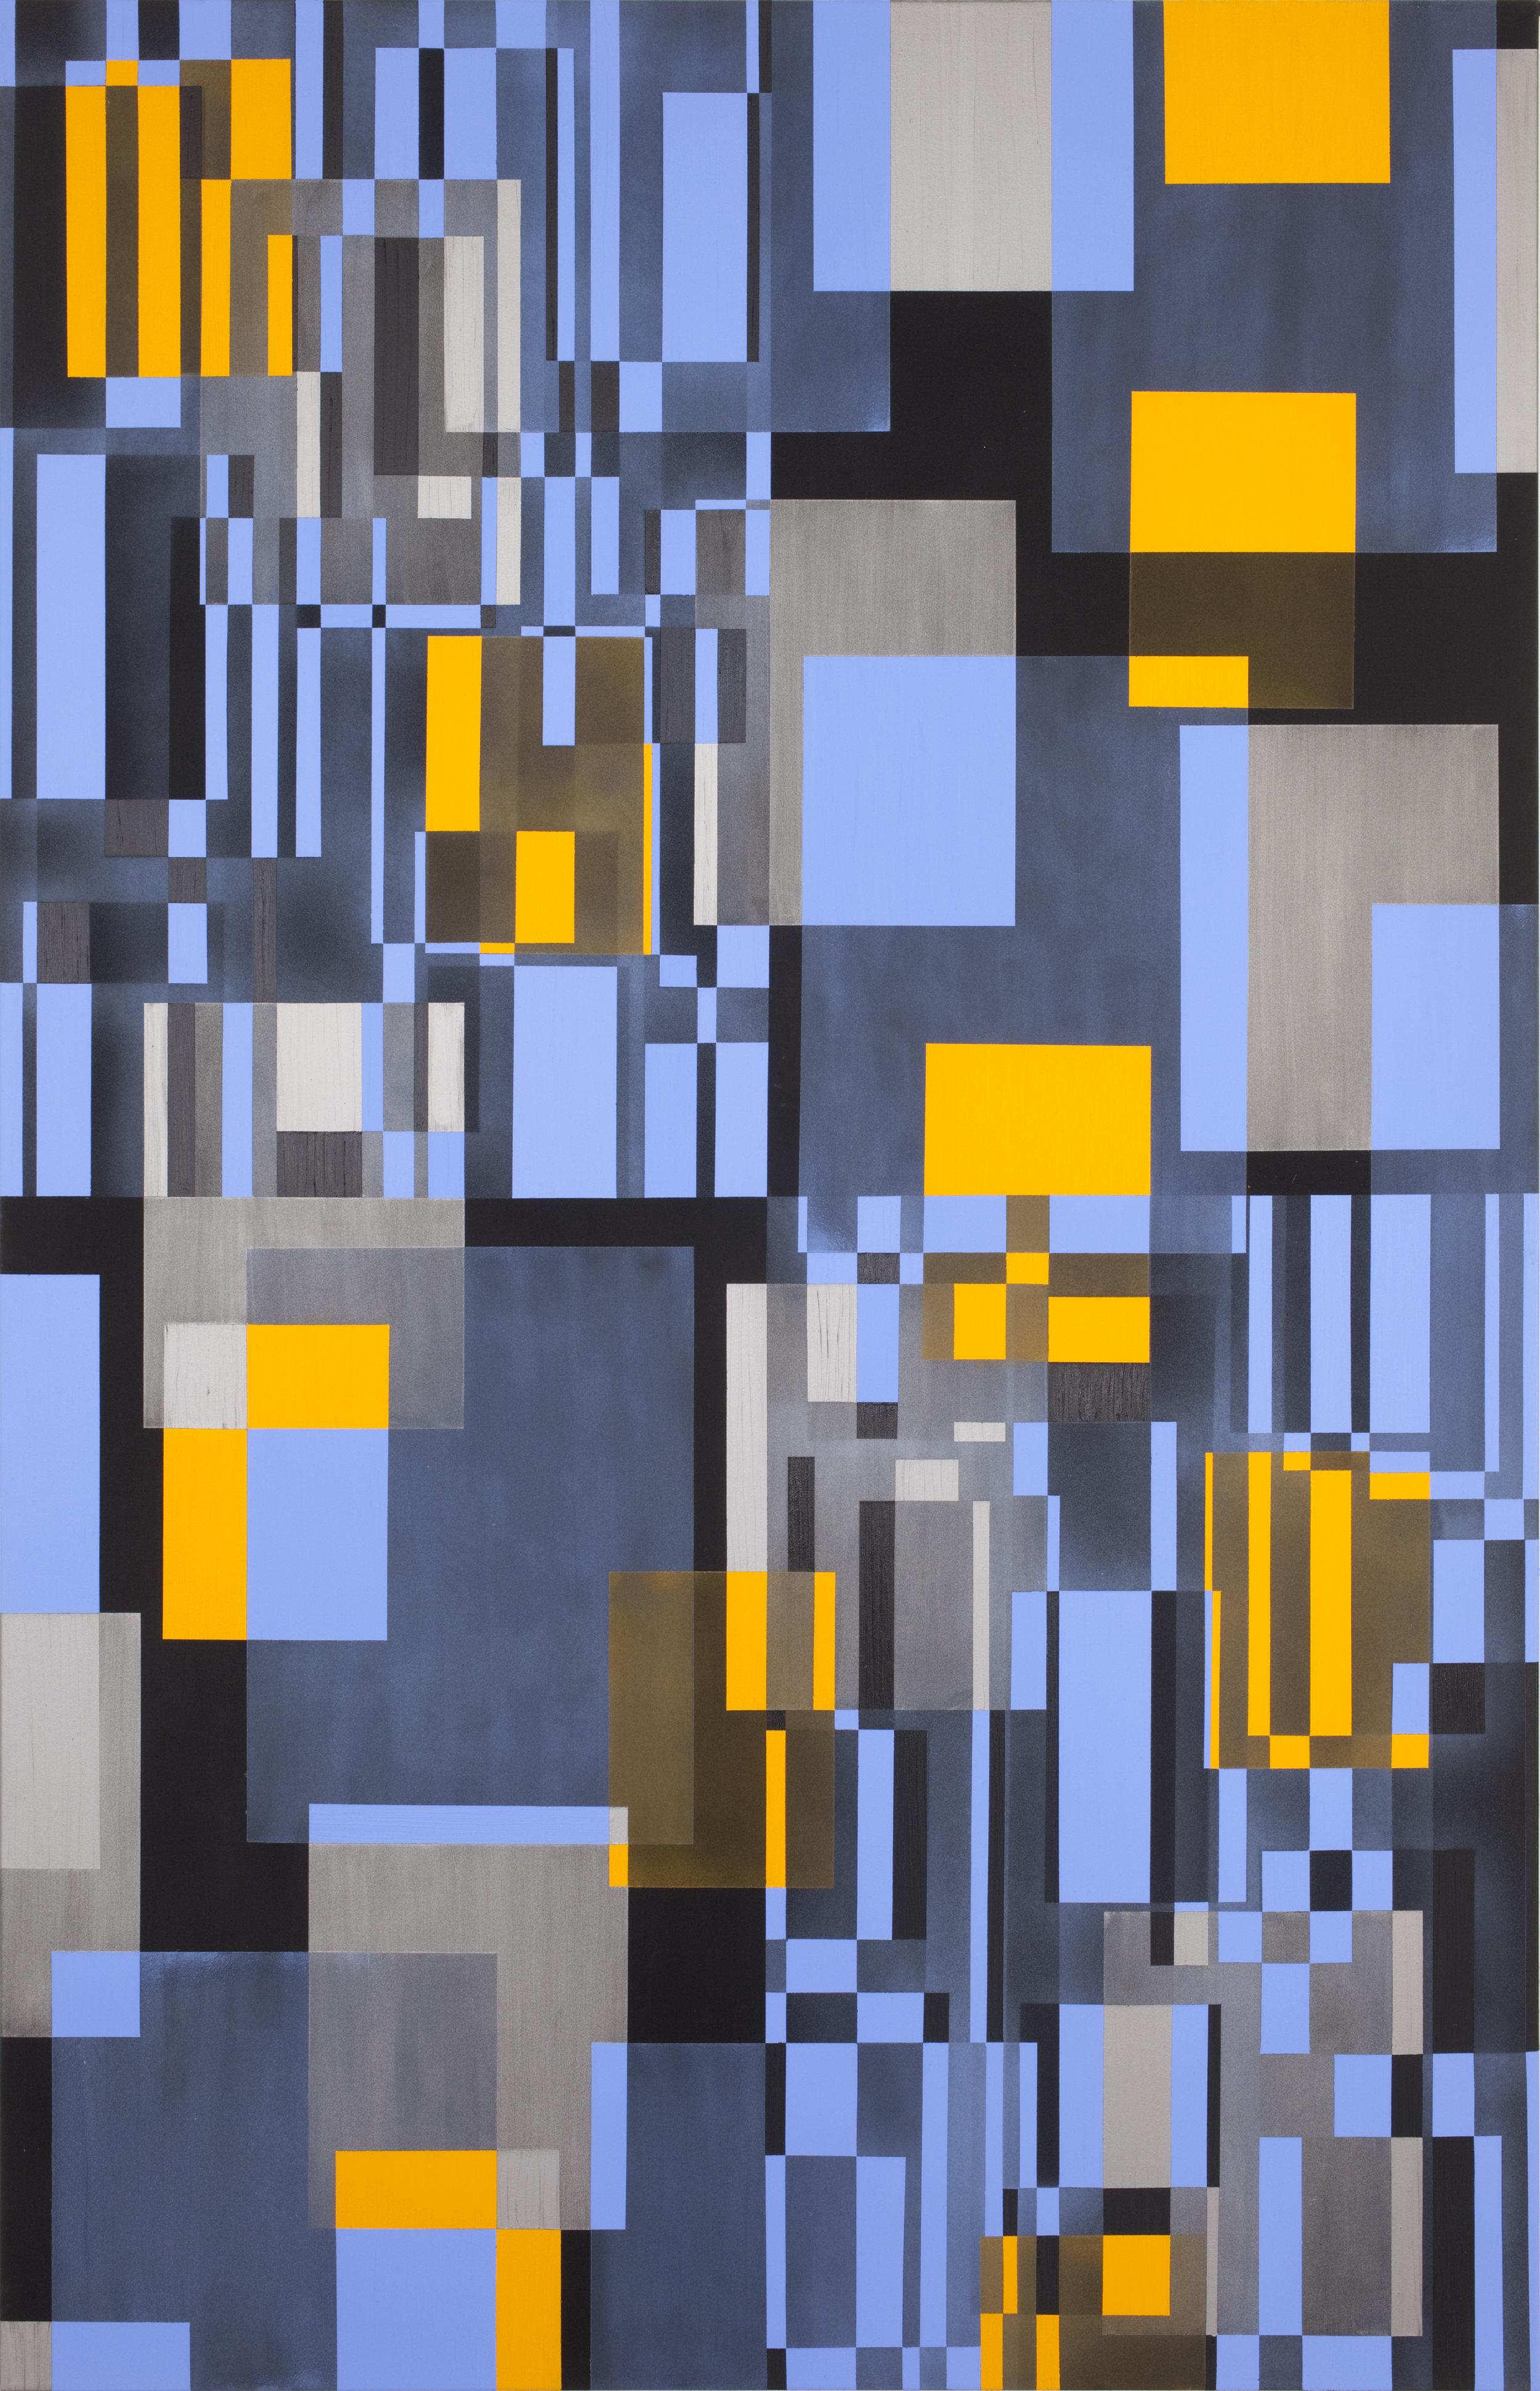 - 6. Marianne Therese Grønnow. Light. Dusk. Darkness, 2012. Acrylic on canvas. 240 x 140 cm.